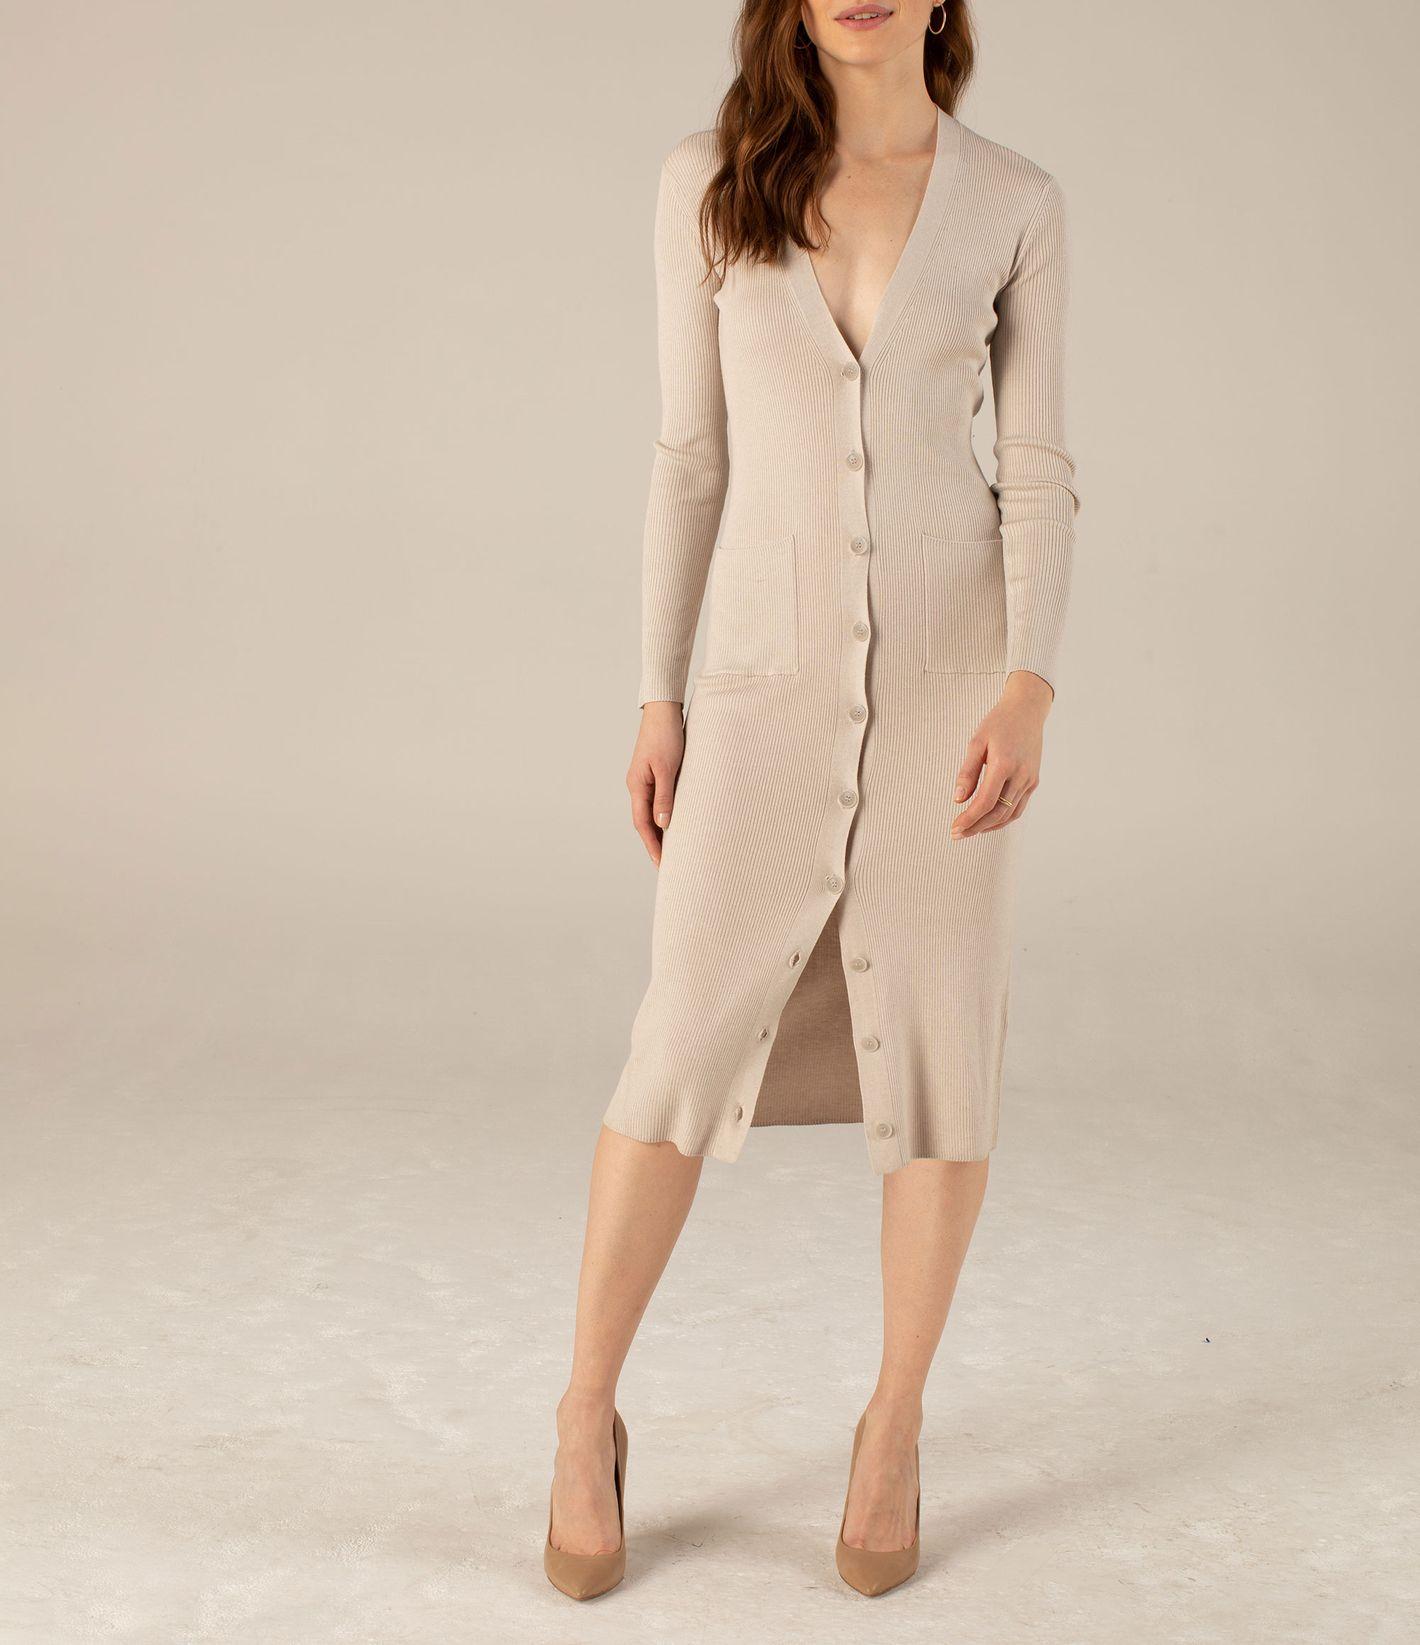 Long Sleeve Cardigan Dress in Pebble